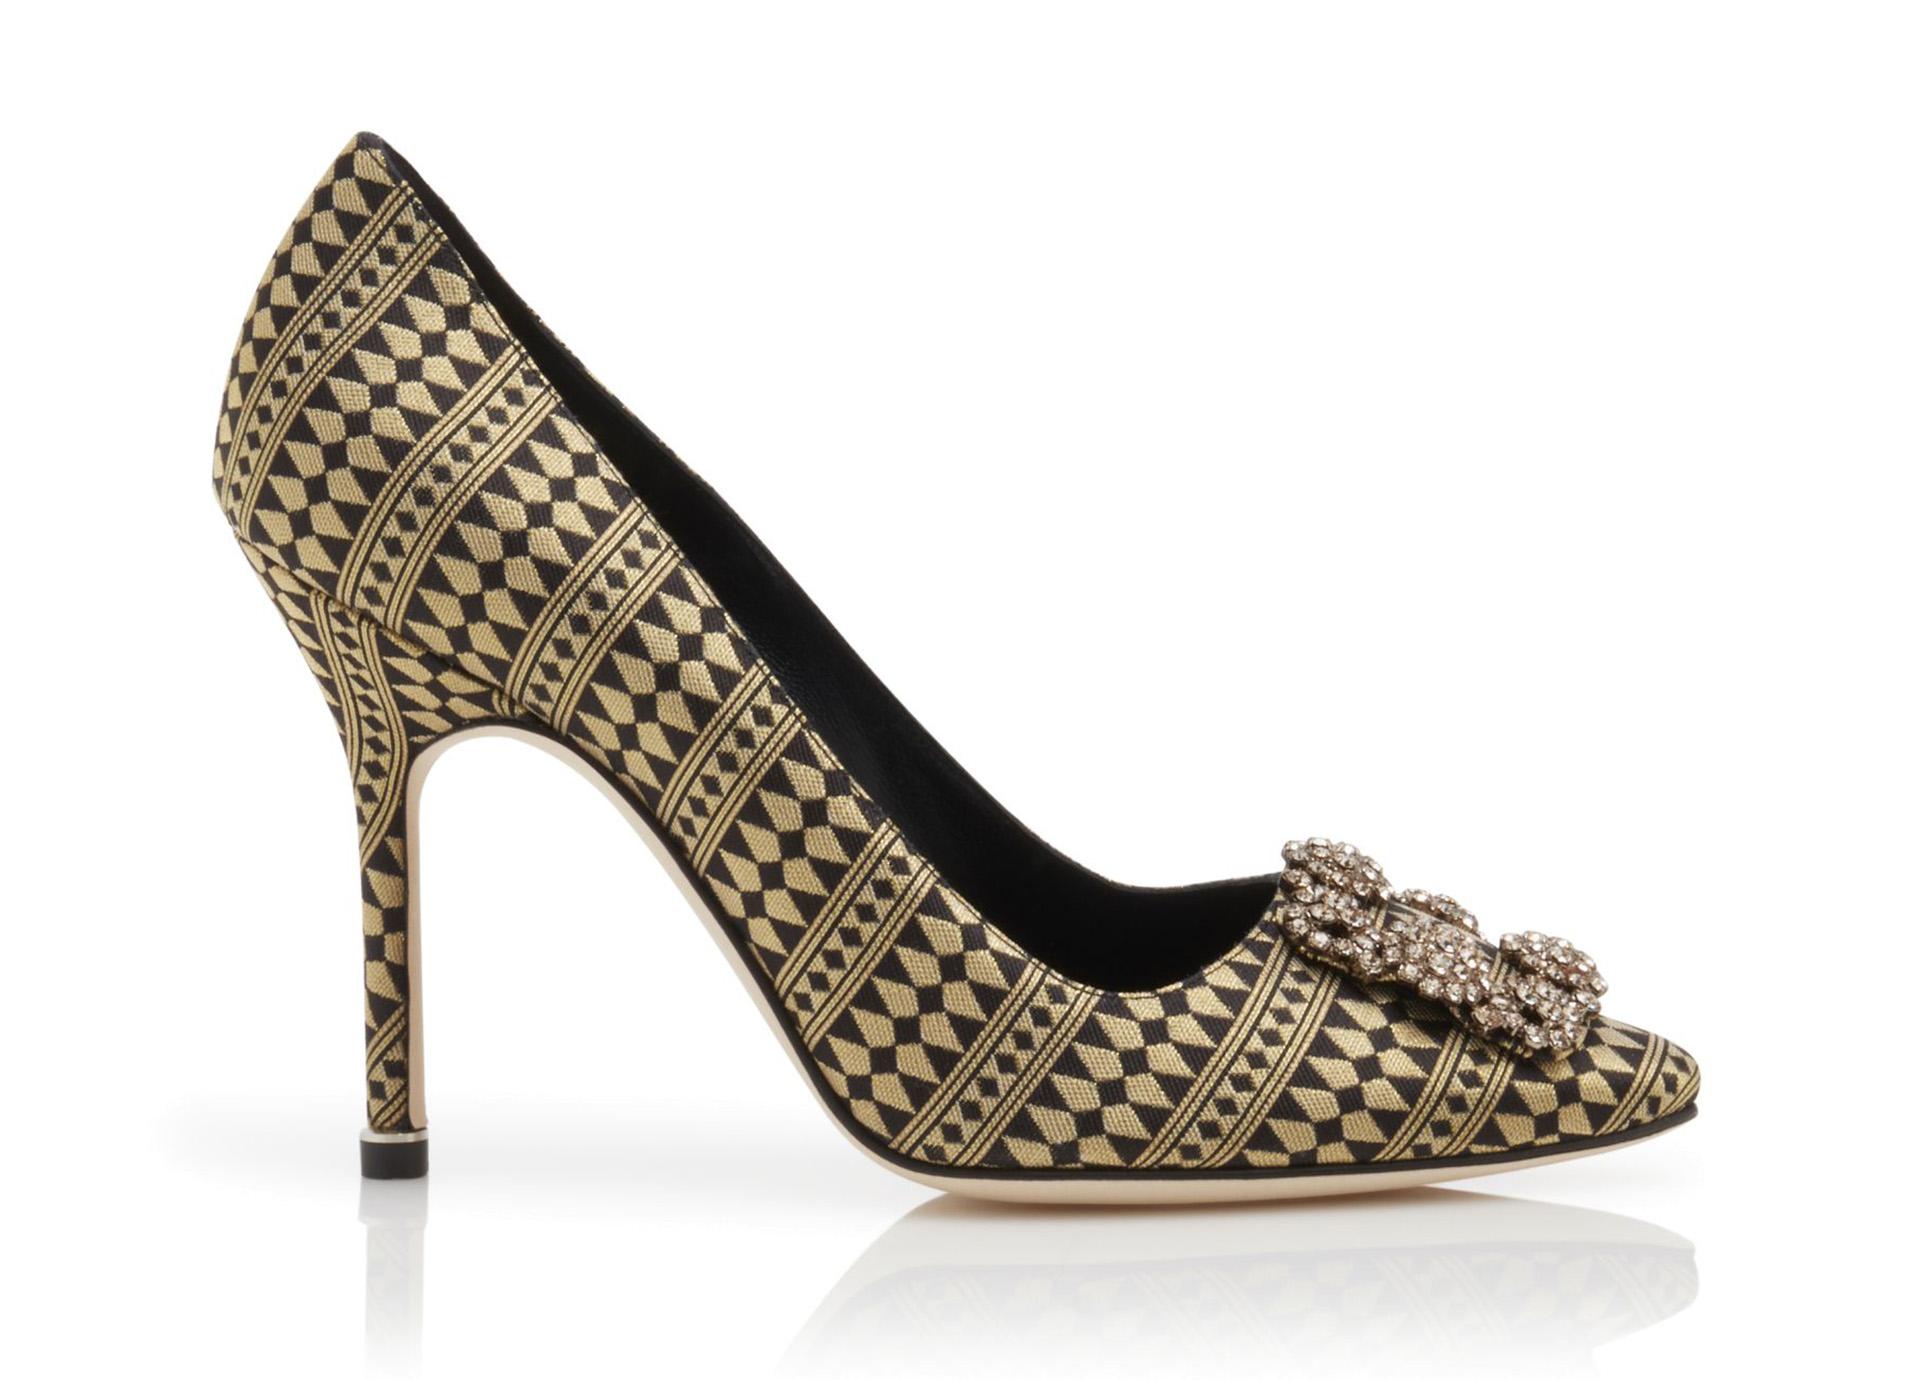 Zapatos Hangisi Jacquar de Manolo Blahnik